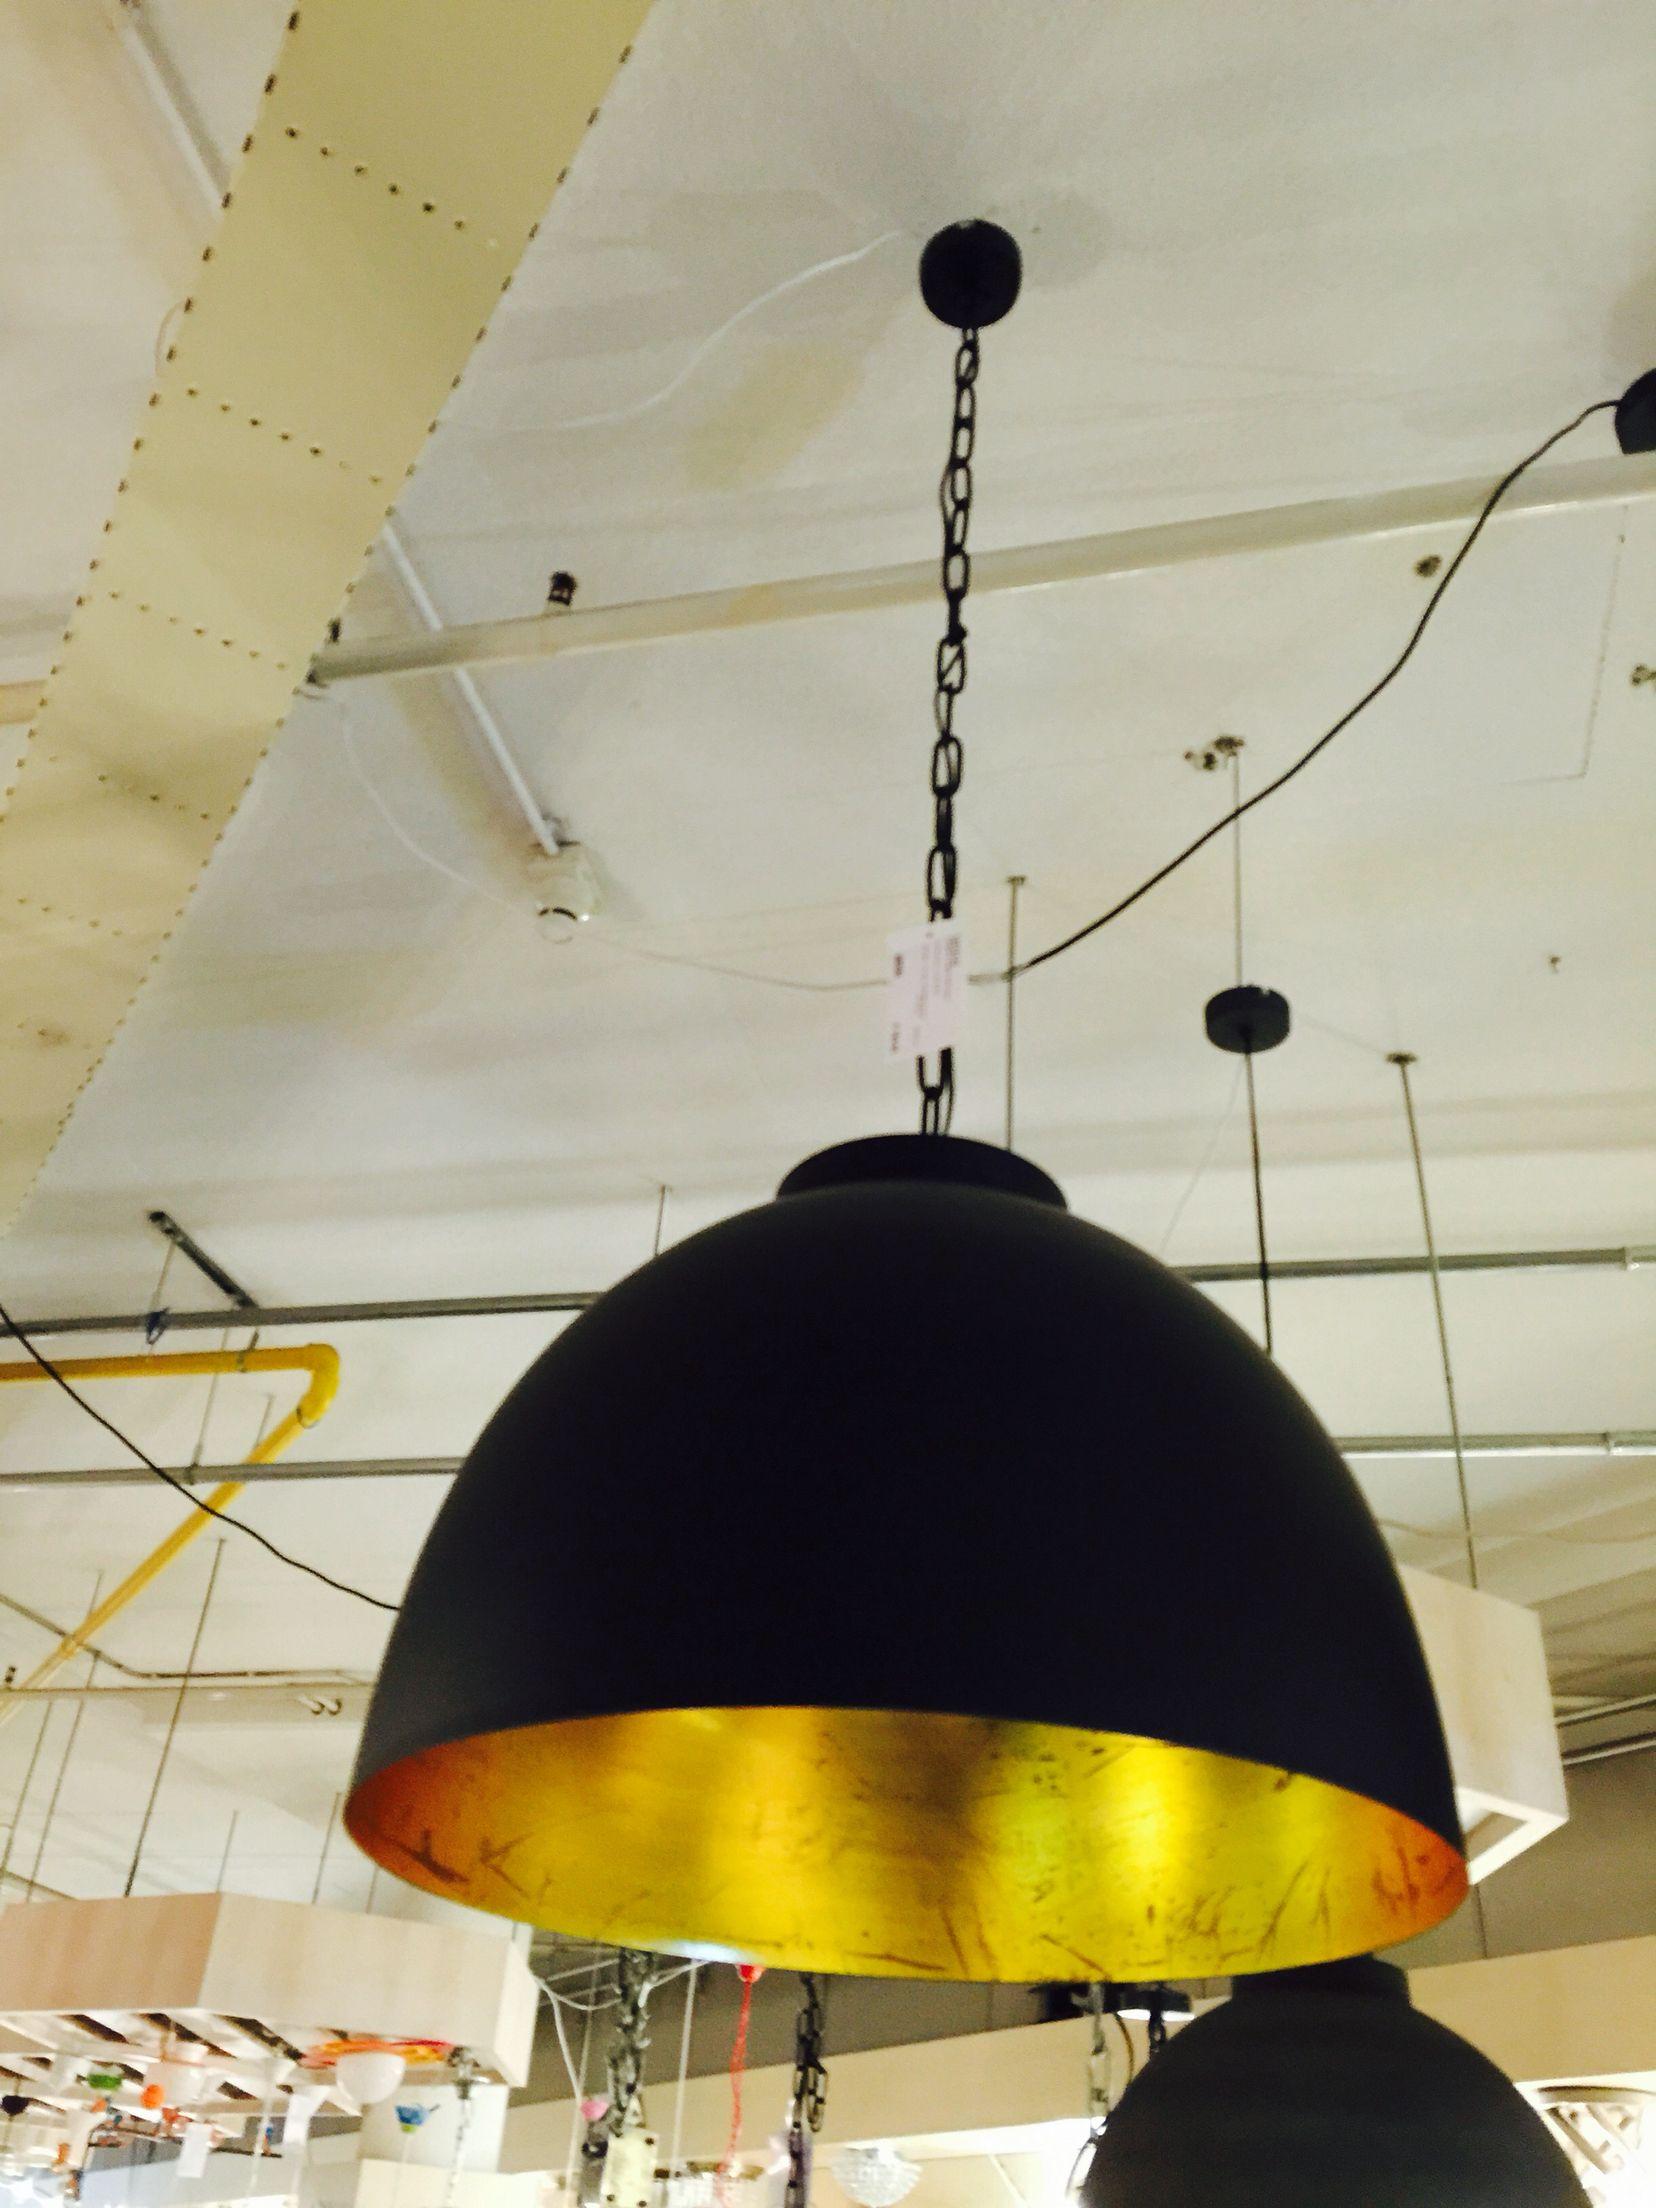 Lamp straluma | Lampen | Pinterest - Verlichting en Lampen